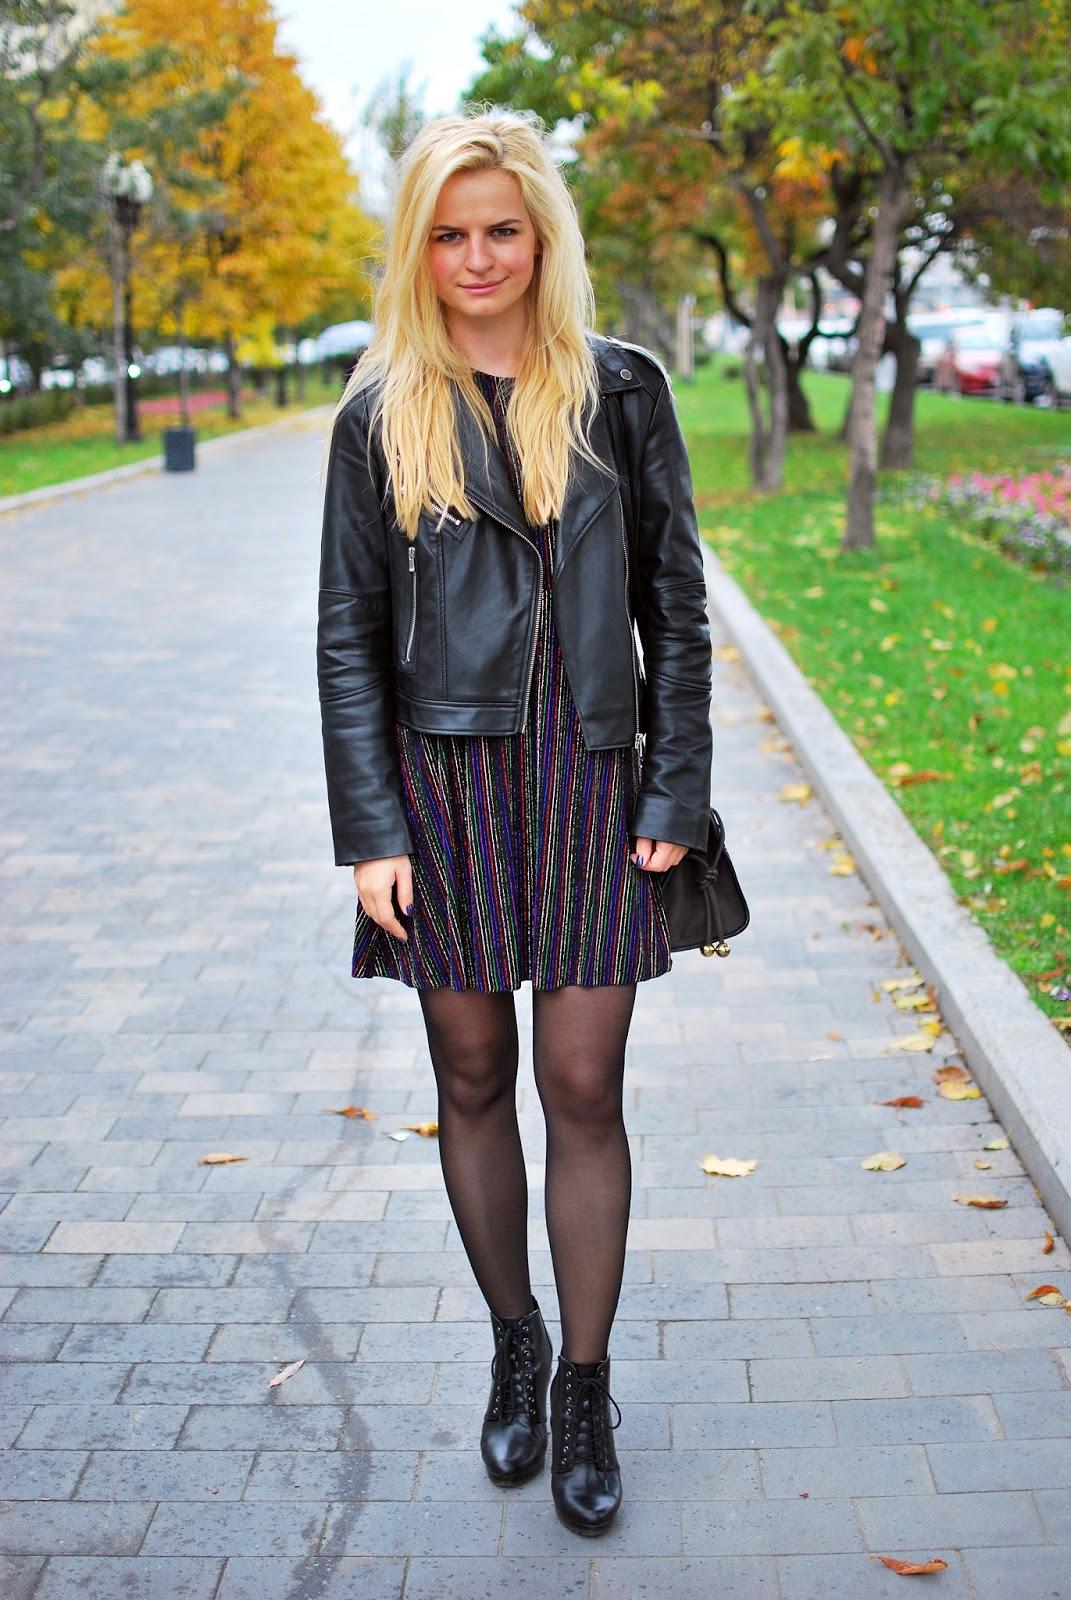 street fashion 2016, street style moscow, уличная мода 2016, с чем носить кожаную куртку